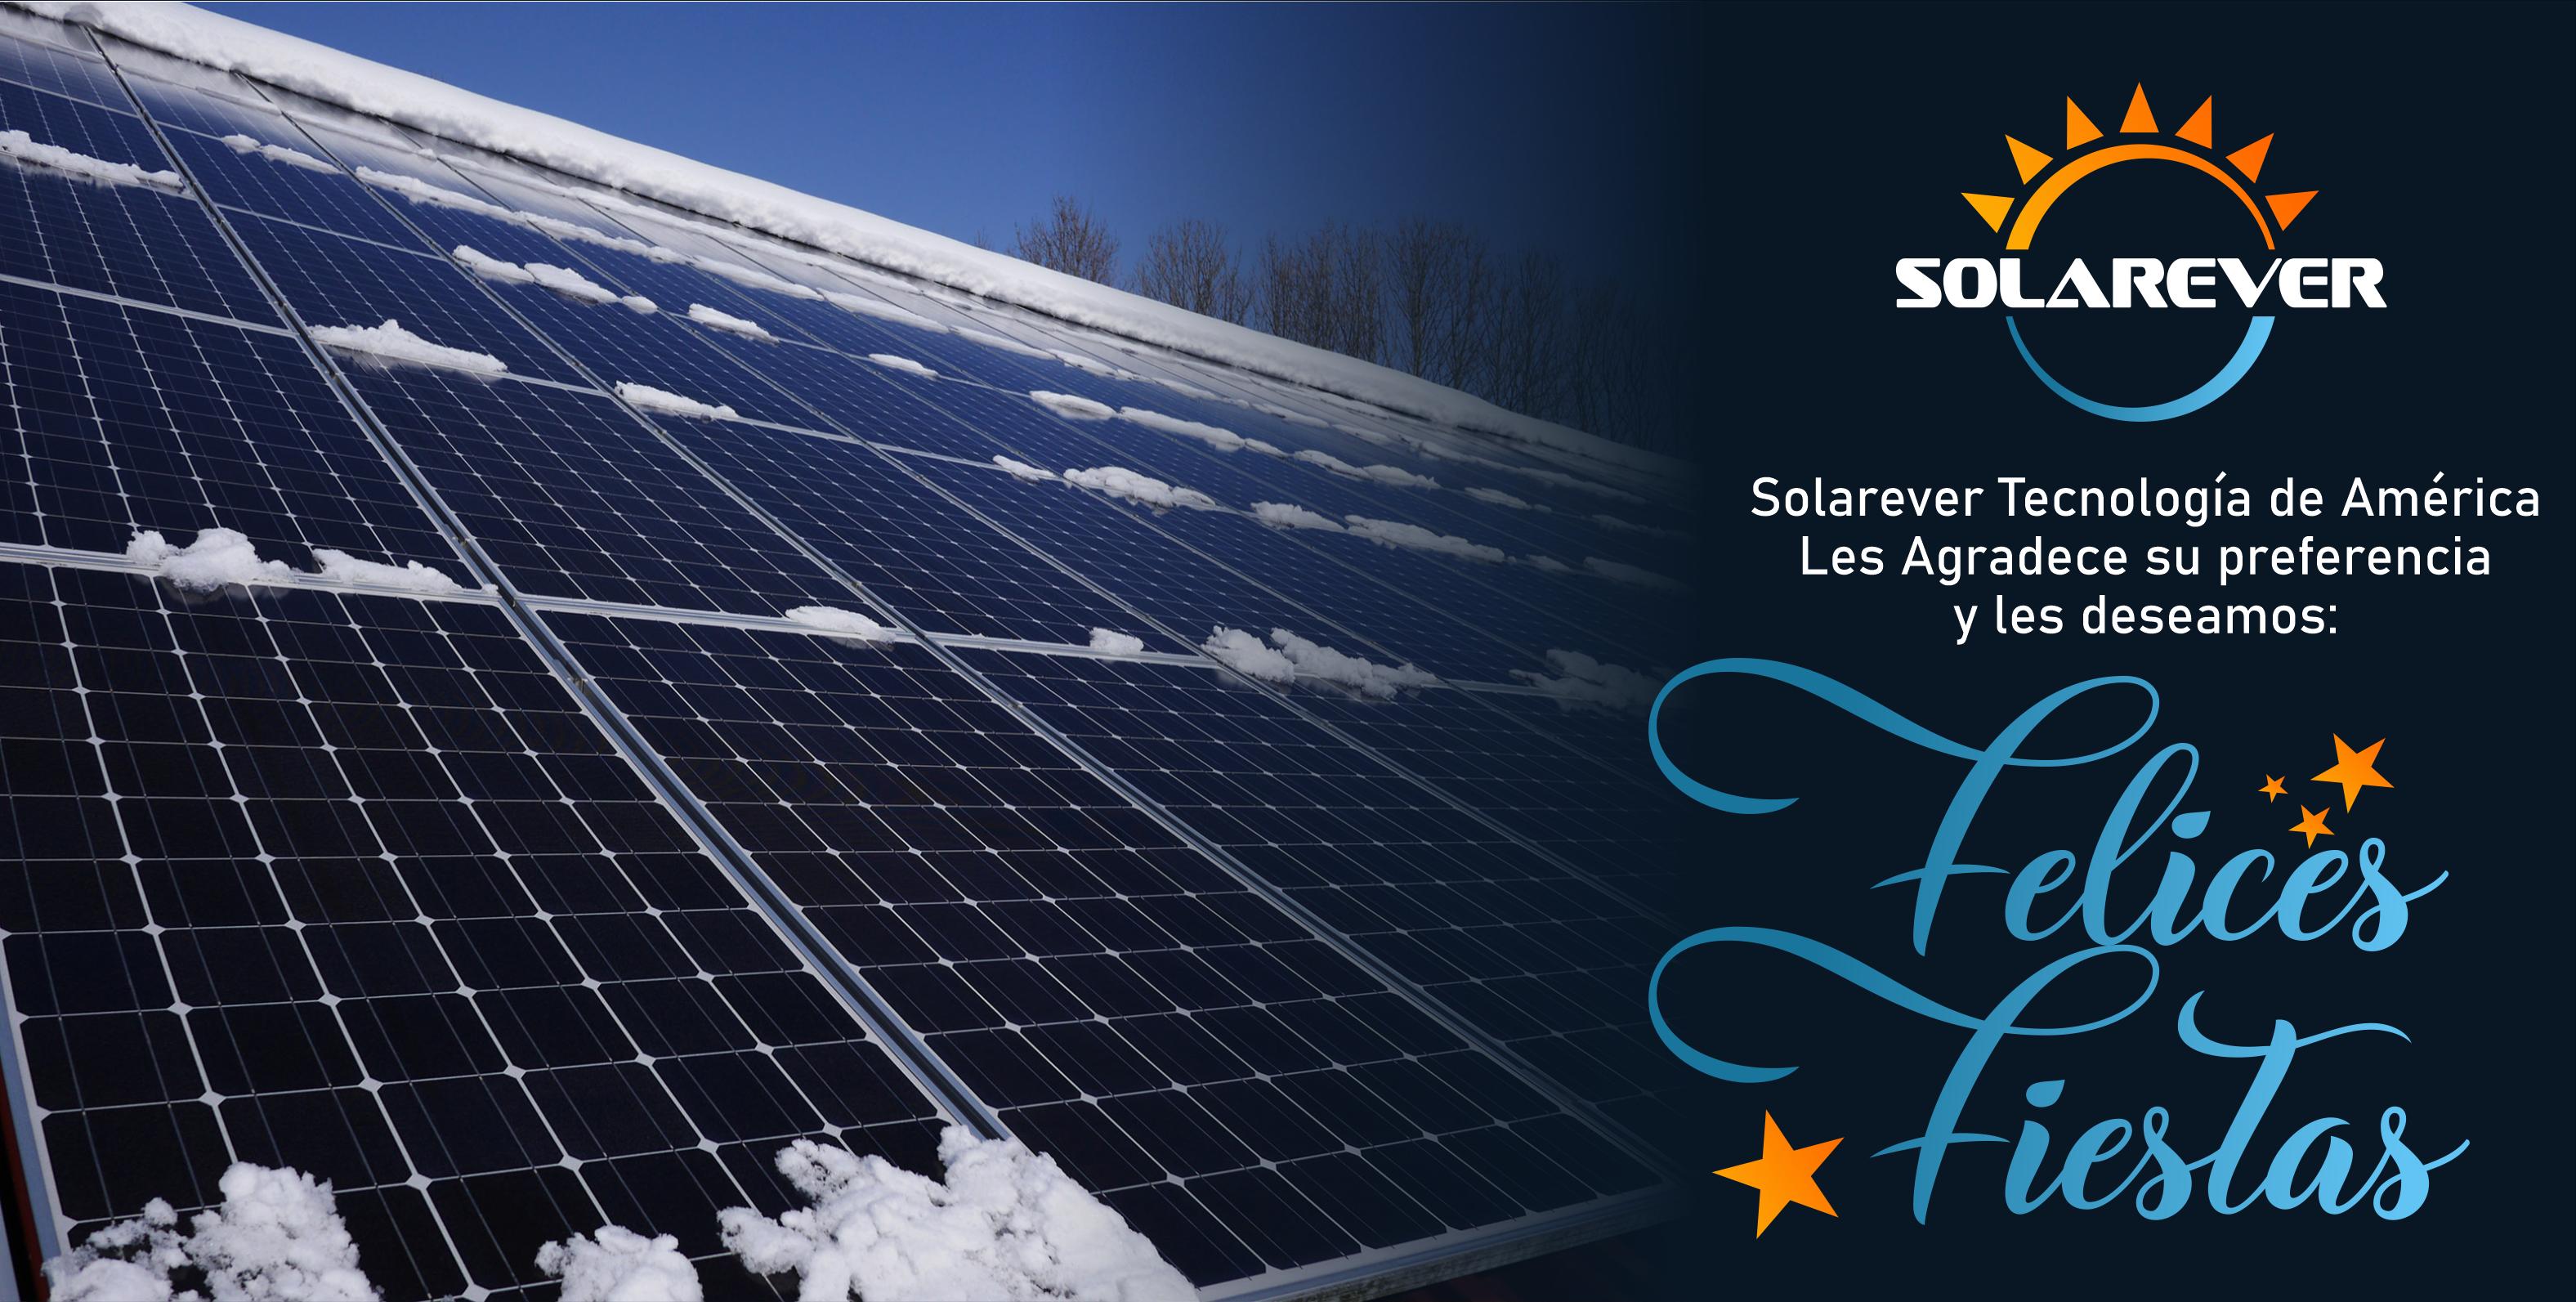 Solarever Tecnología de América les desea felices fiestas